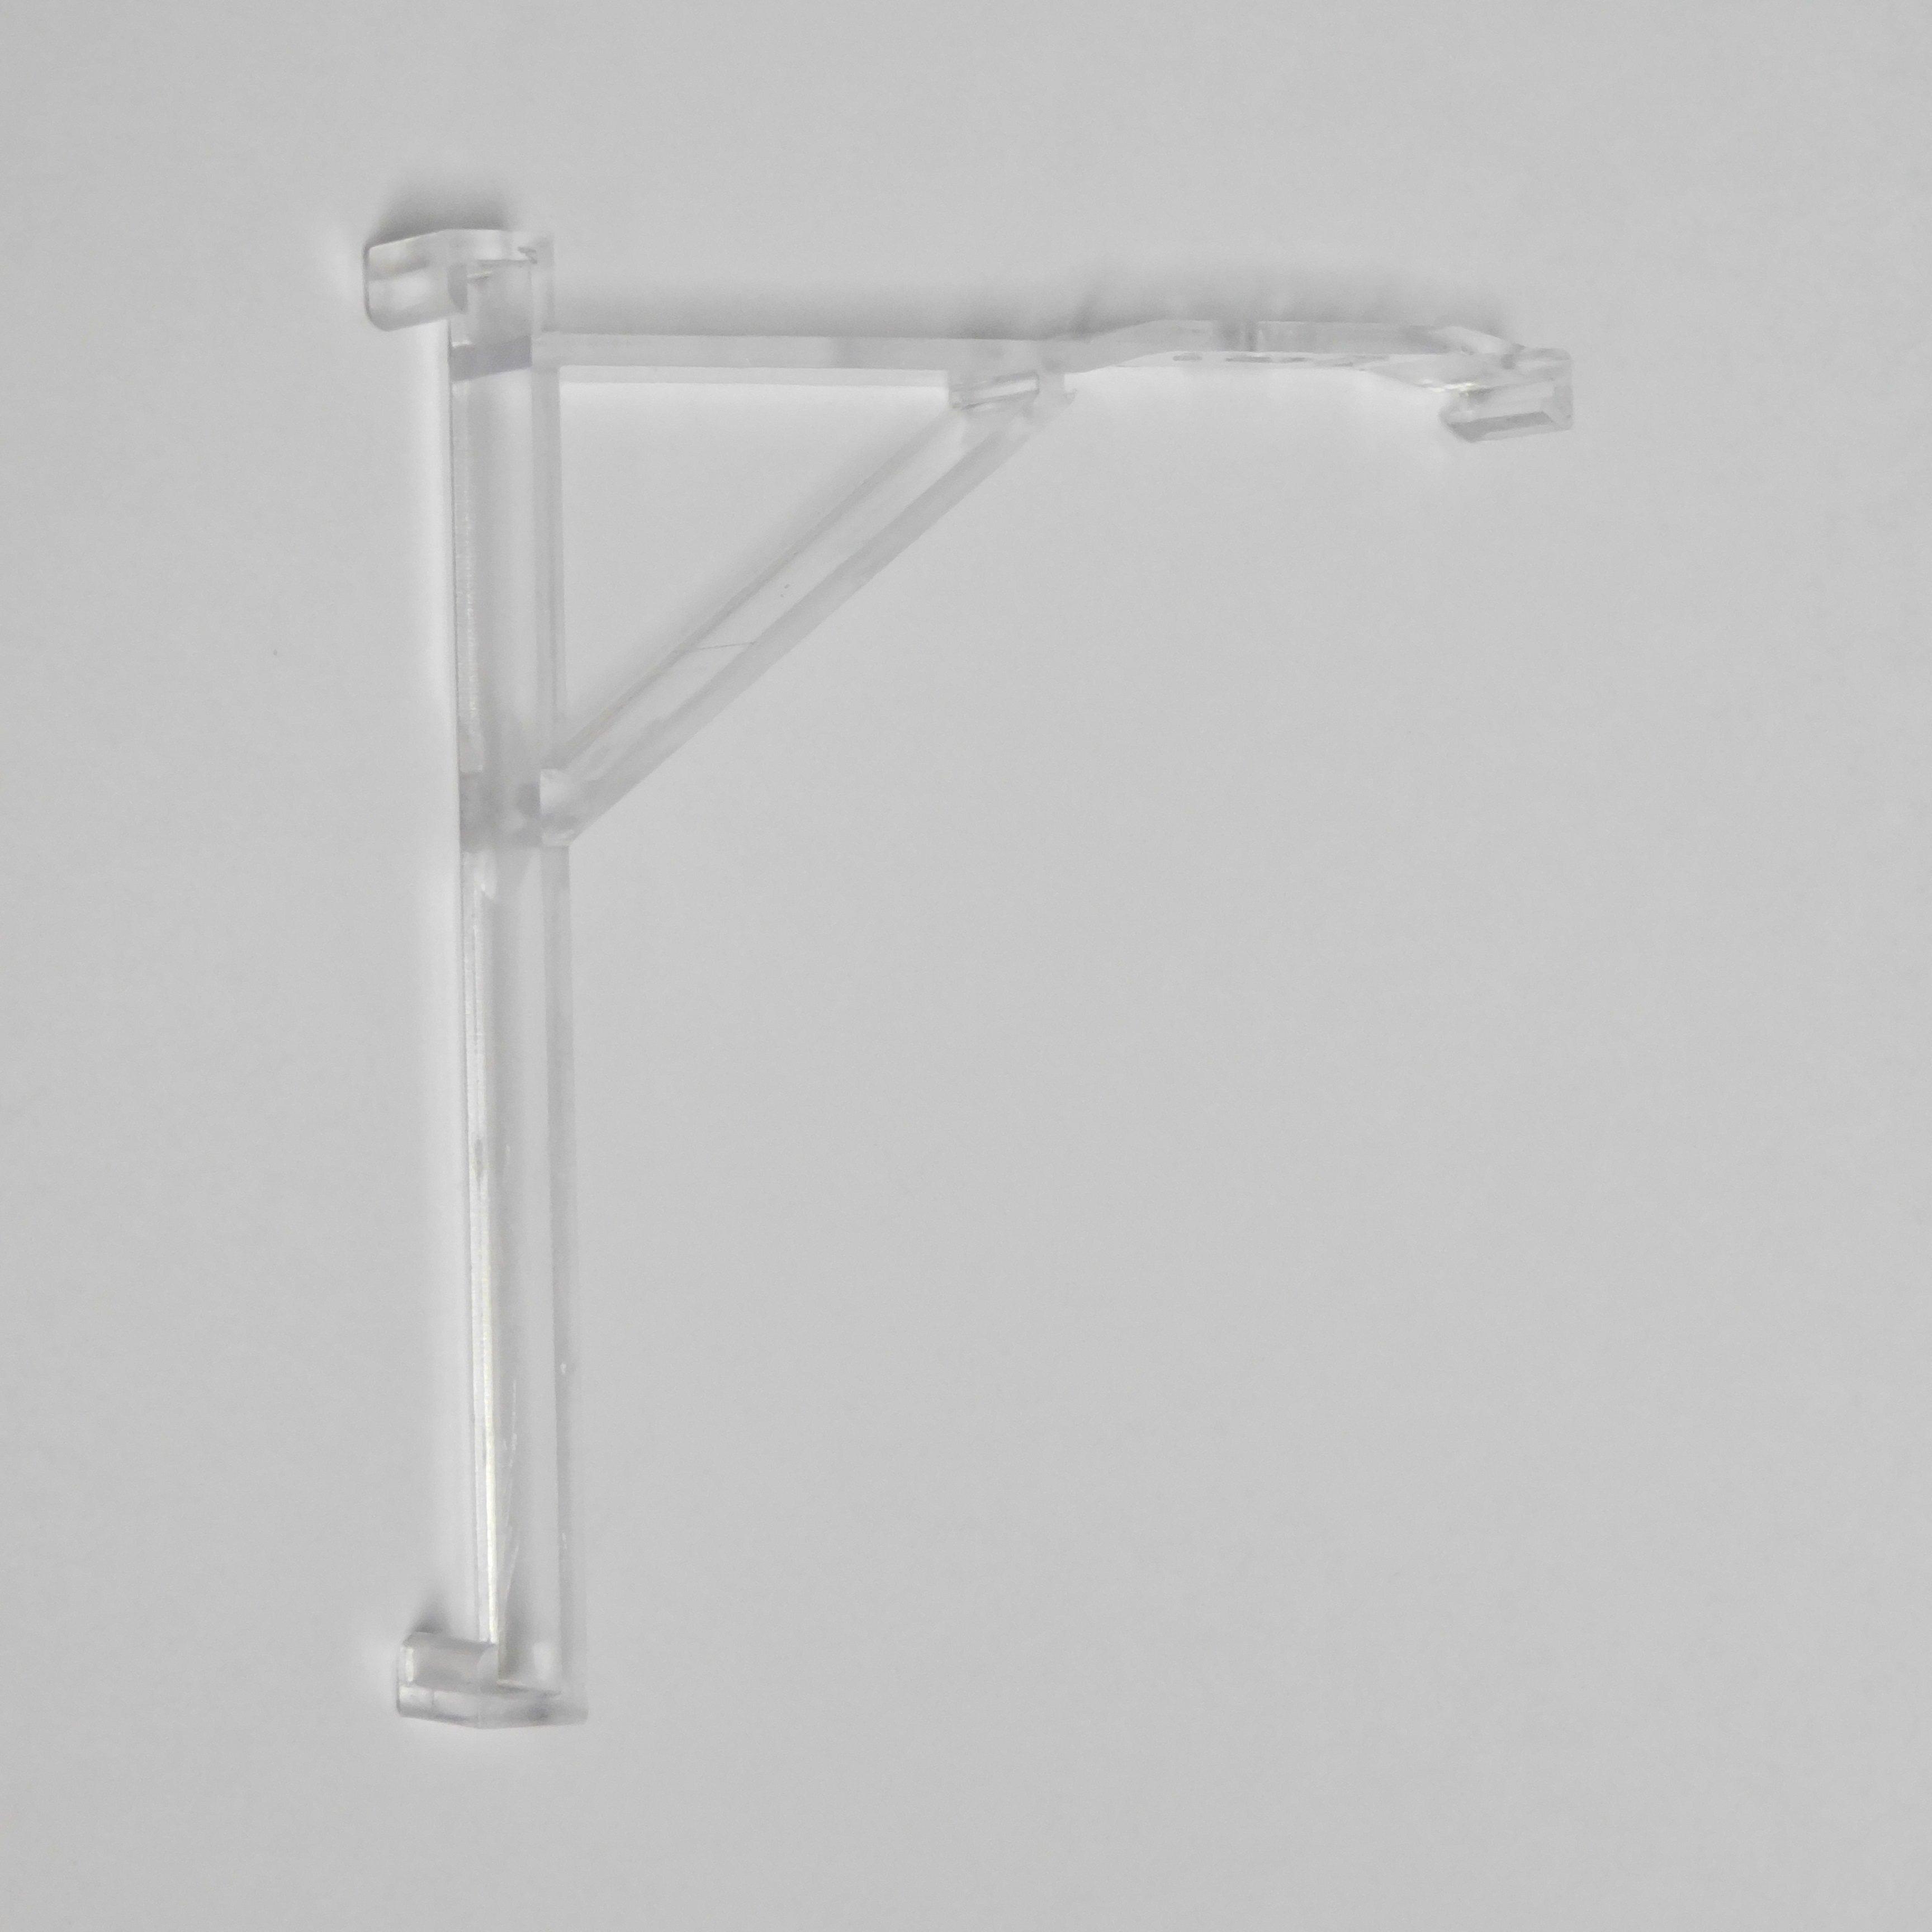 1 3 8 Inch Vertical Blind Panel Valance Clip 1